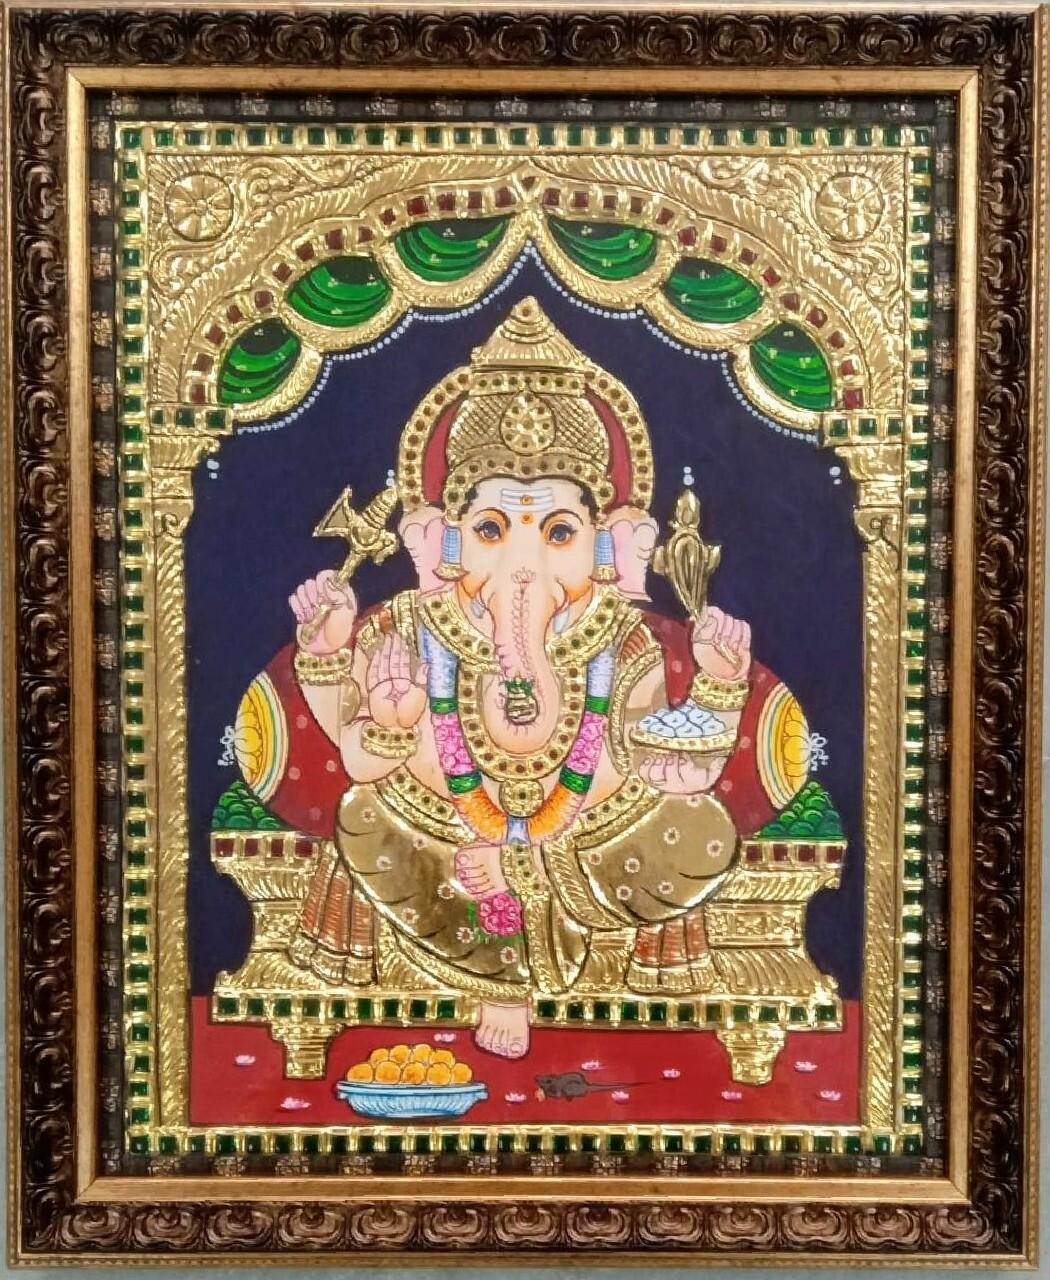 Lord Ganesh - Tanjore Art work Gold Foil Frame